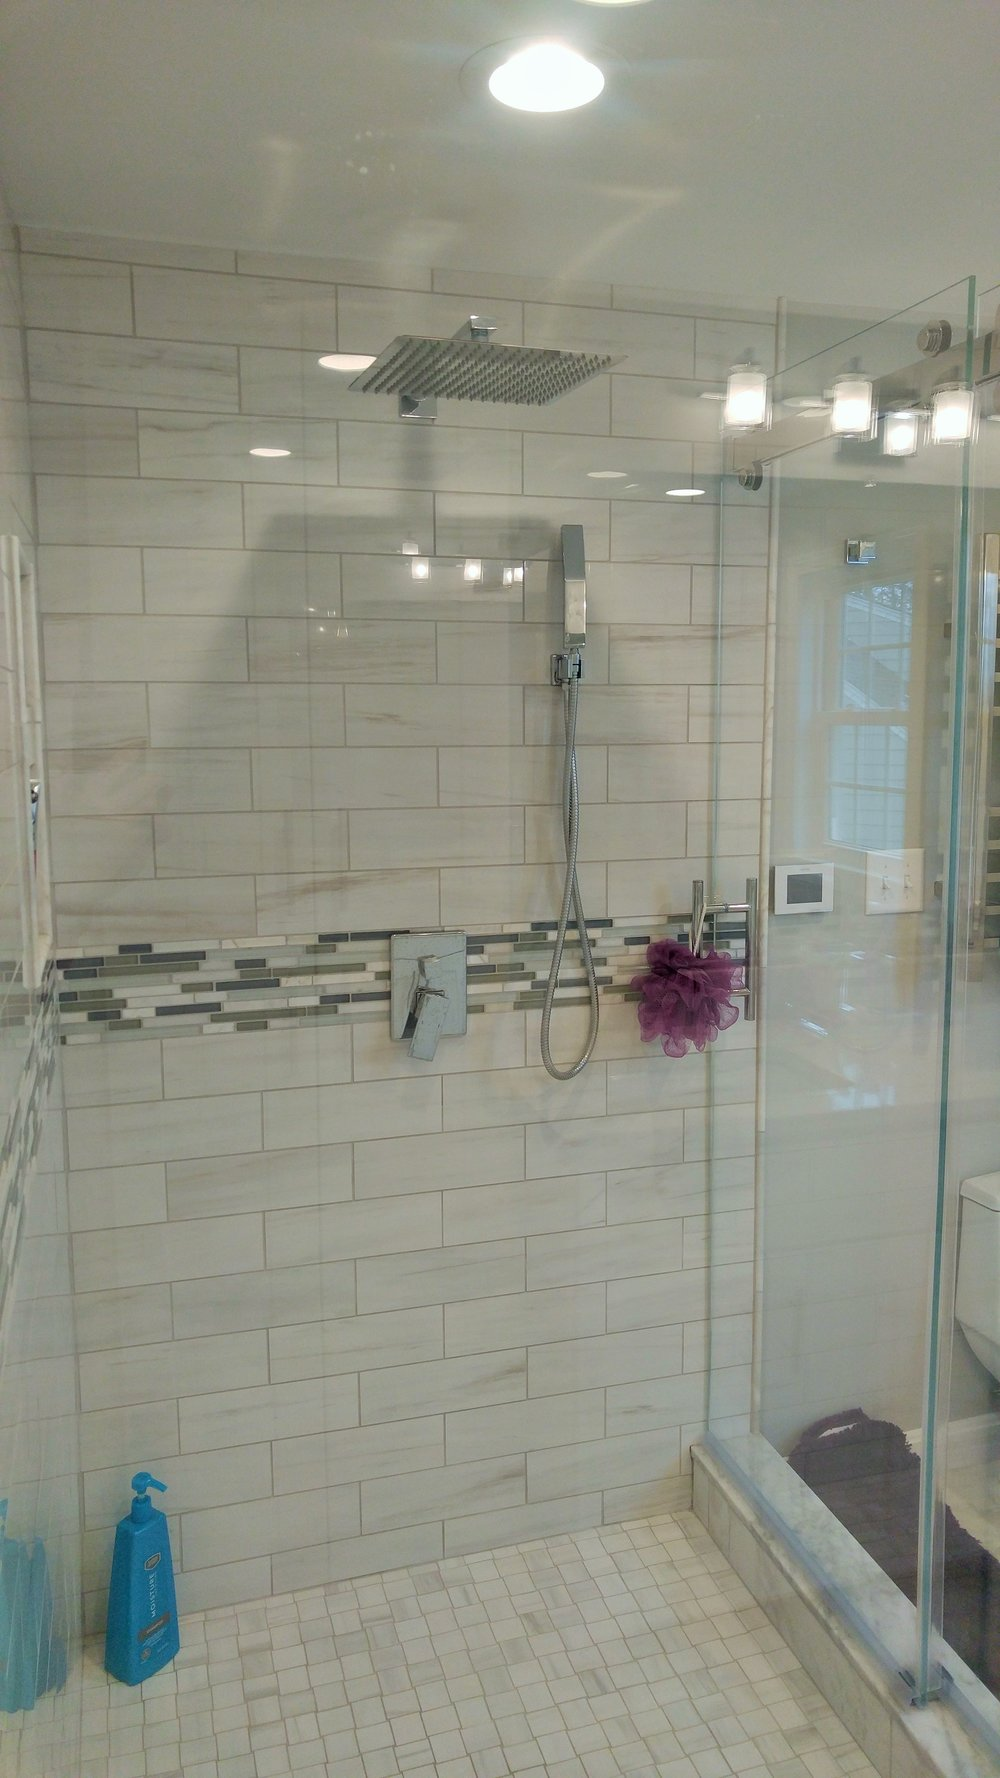 Upscale Bathroom Renovation/Remodel - Shrewsbury MA